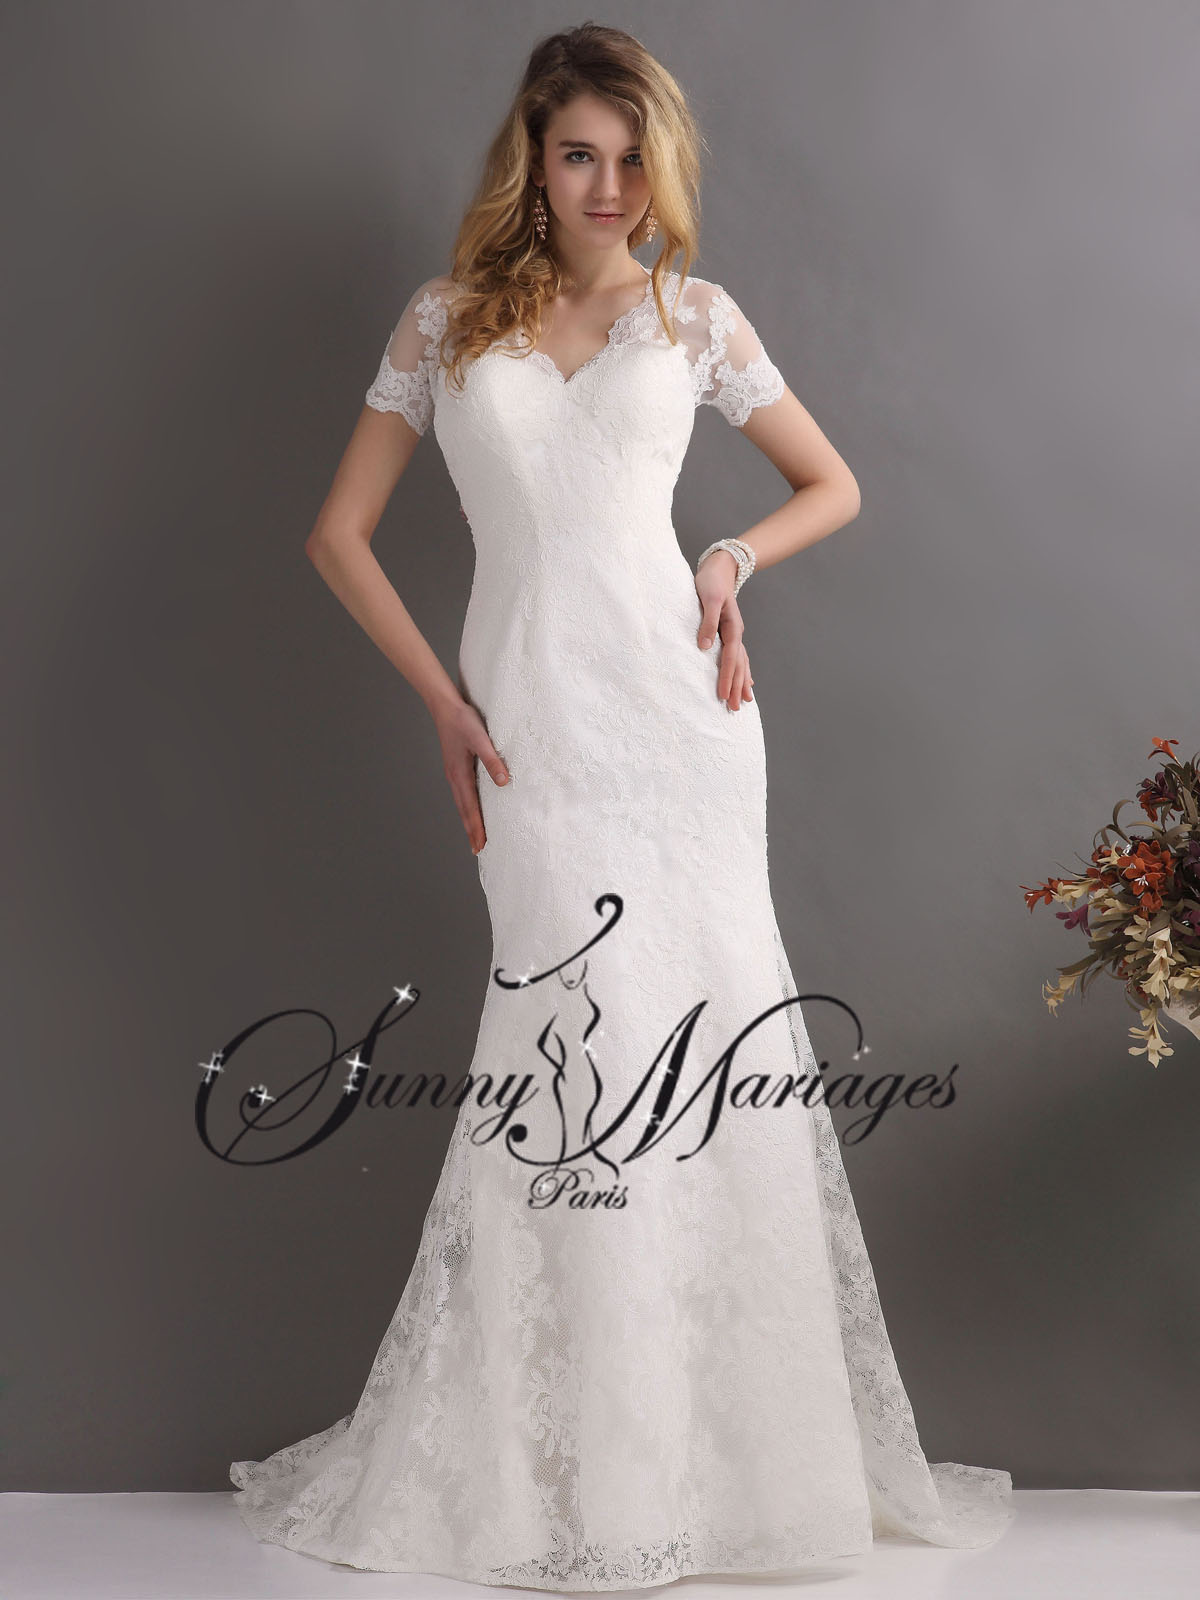 ... Sunny Mariage » robe de mariée » Robe de mariee sirène « Rosa